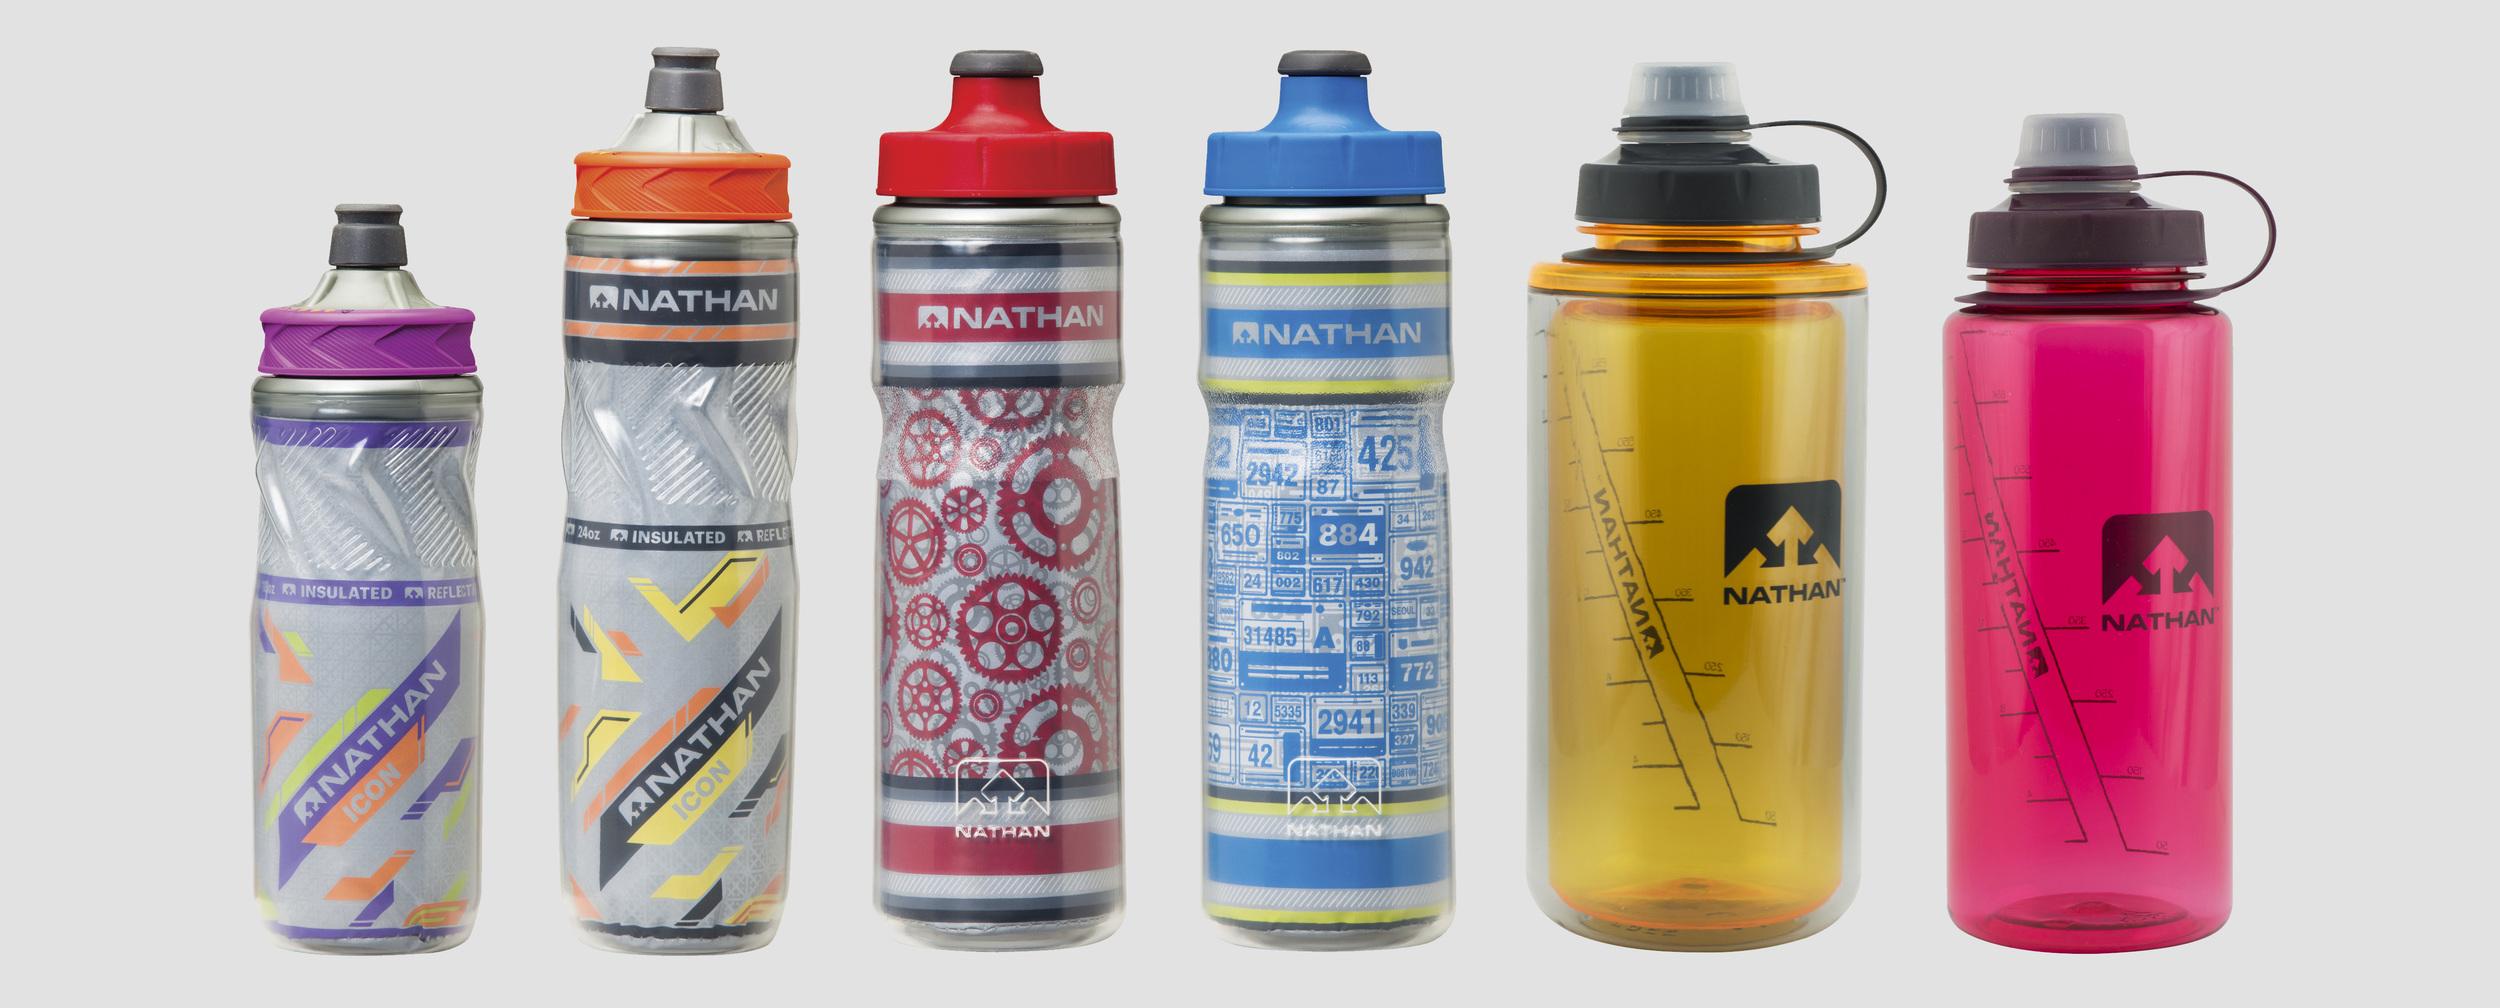 Icon 18oz Insulated bottle, Icon 22oz Insulated bottle, Freewheele  Insulated bottle r, Road 2 Run Insulated bottle, DoubleShot (750mL) bottle, LittleShot (750mL) bottle.